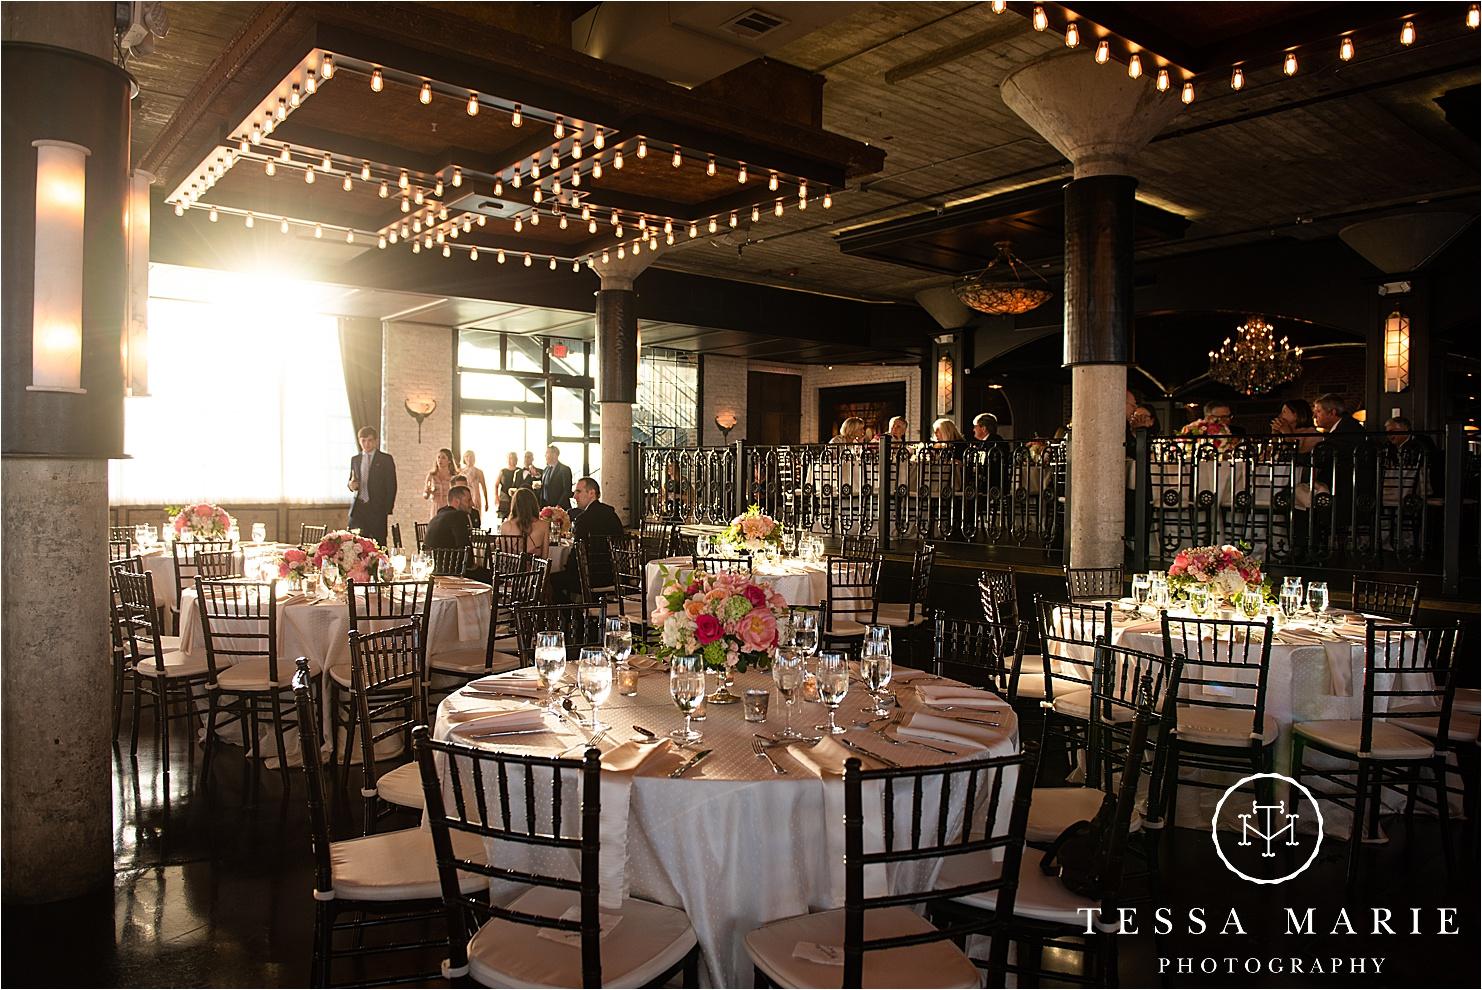 Tessa_marie_weddings_houston_wedding_photographer_The_astorian_0147.jpg